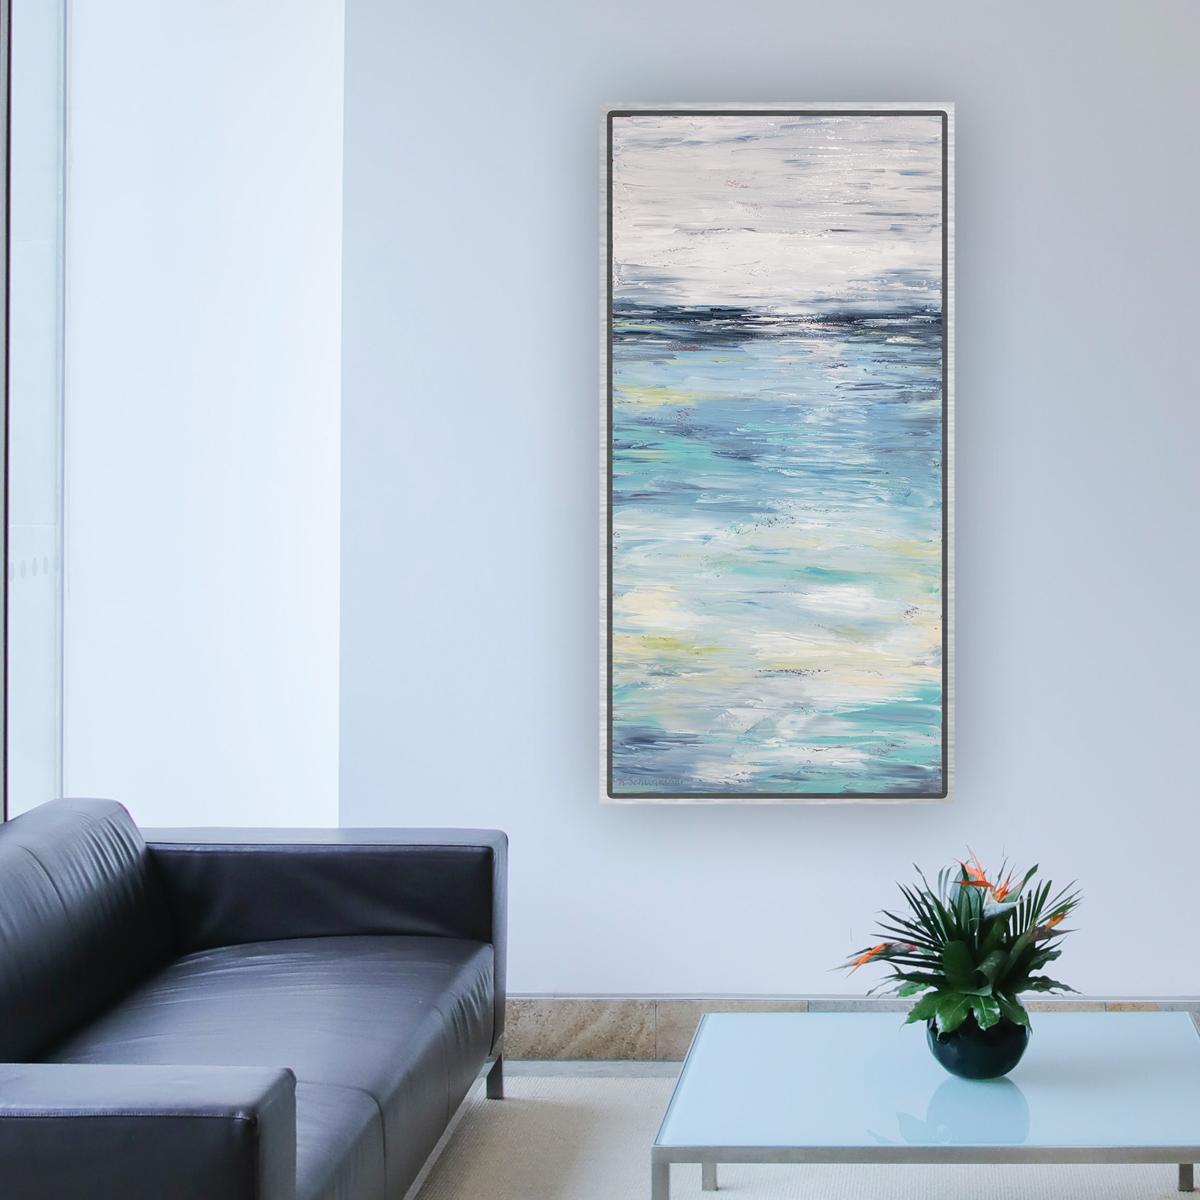 blue warmth hung 50×26